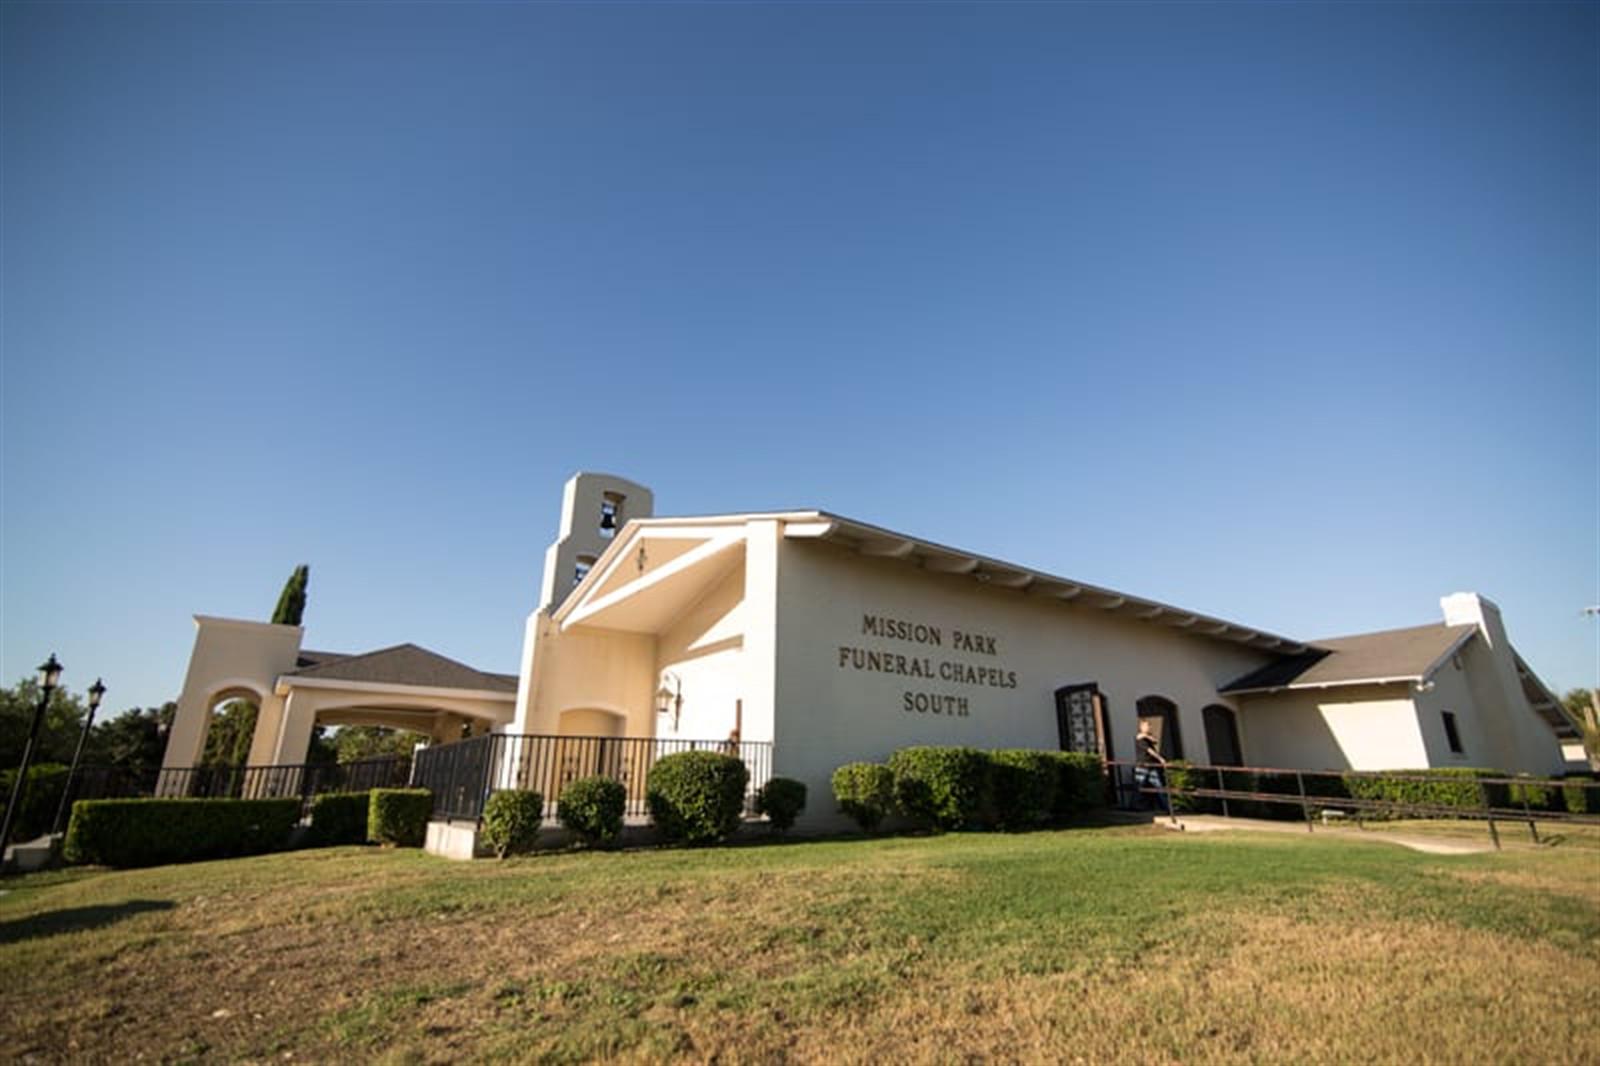 San Antonio Texas Funeral Homes - whopassedon.com